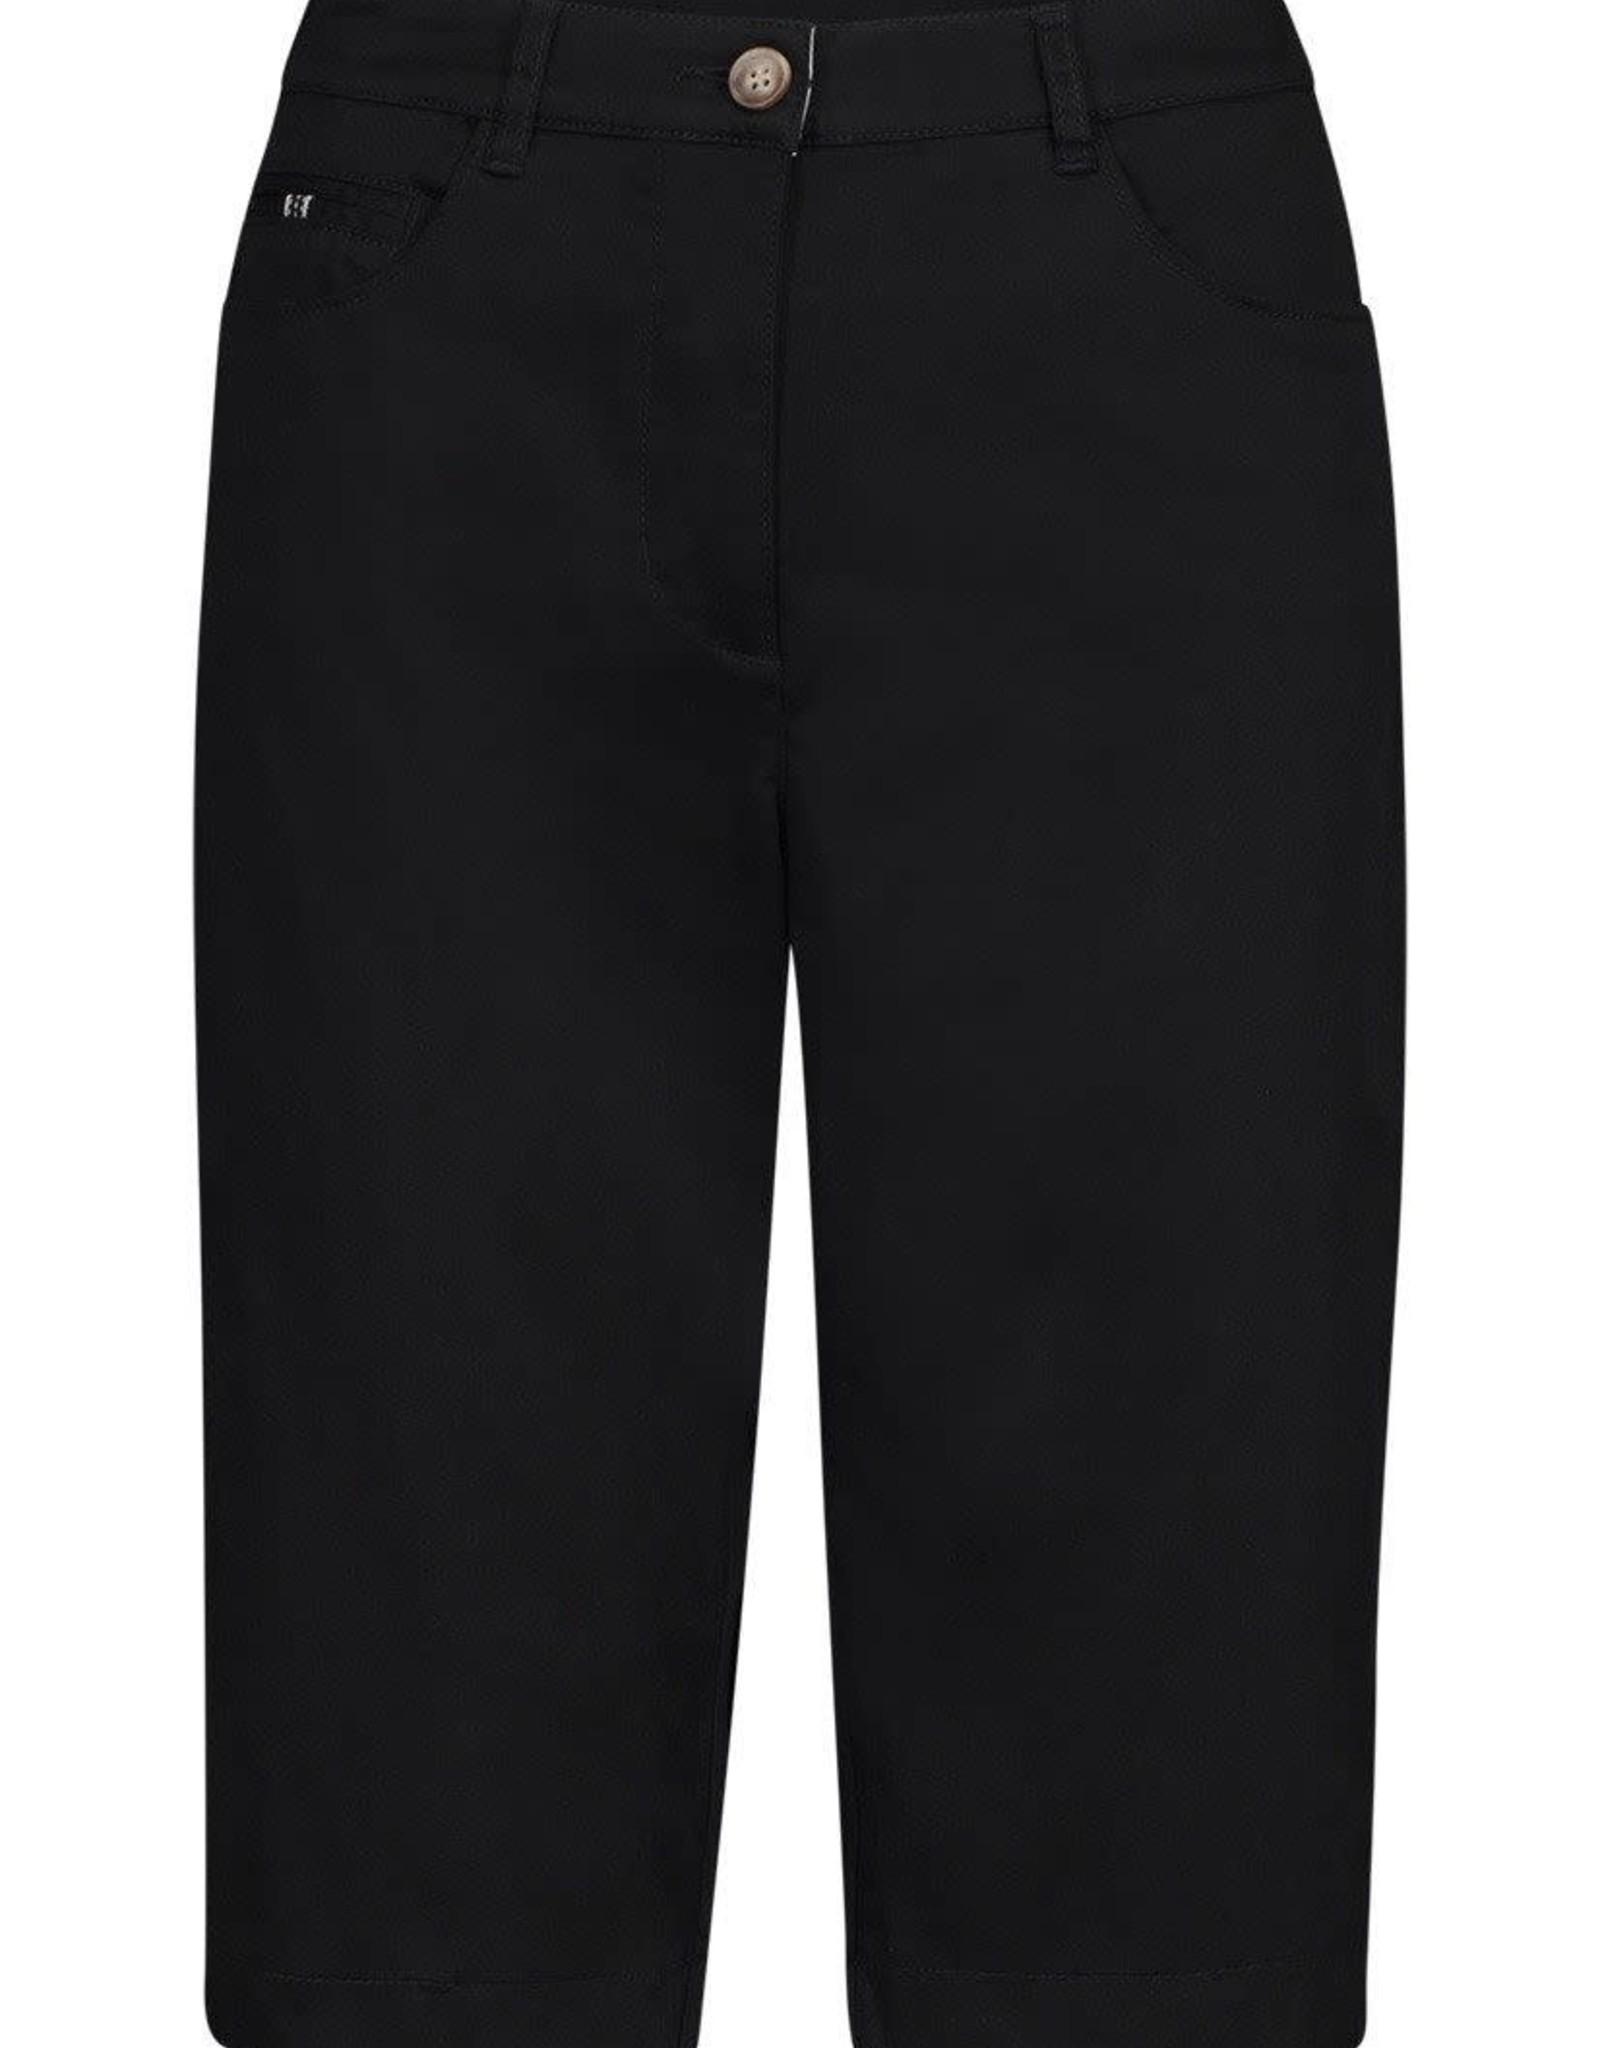 Tribal Tribal 4480O Bermuda Shorts